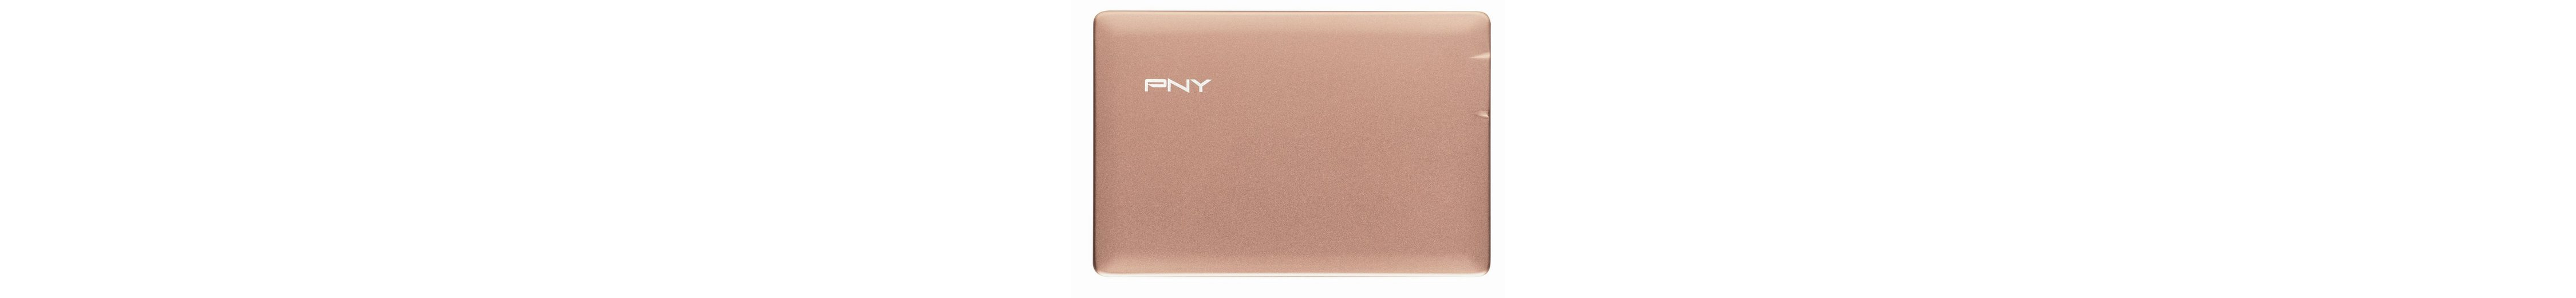 PNY mobiler Akku »Powerpack ALU 2500«